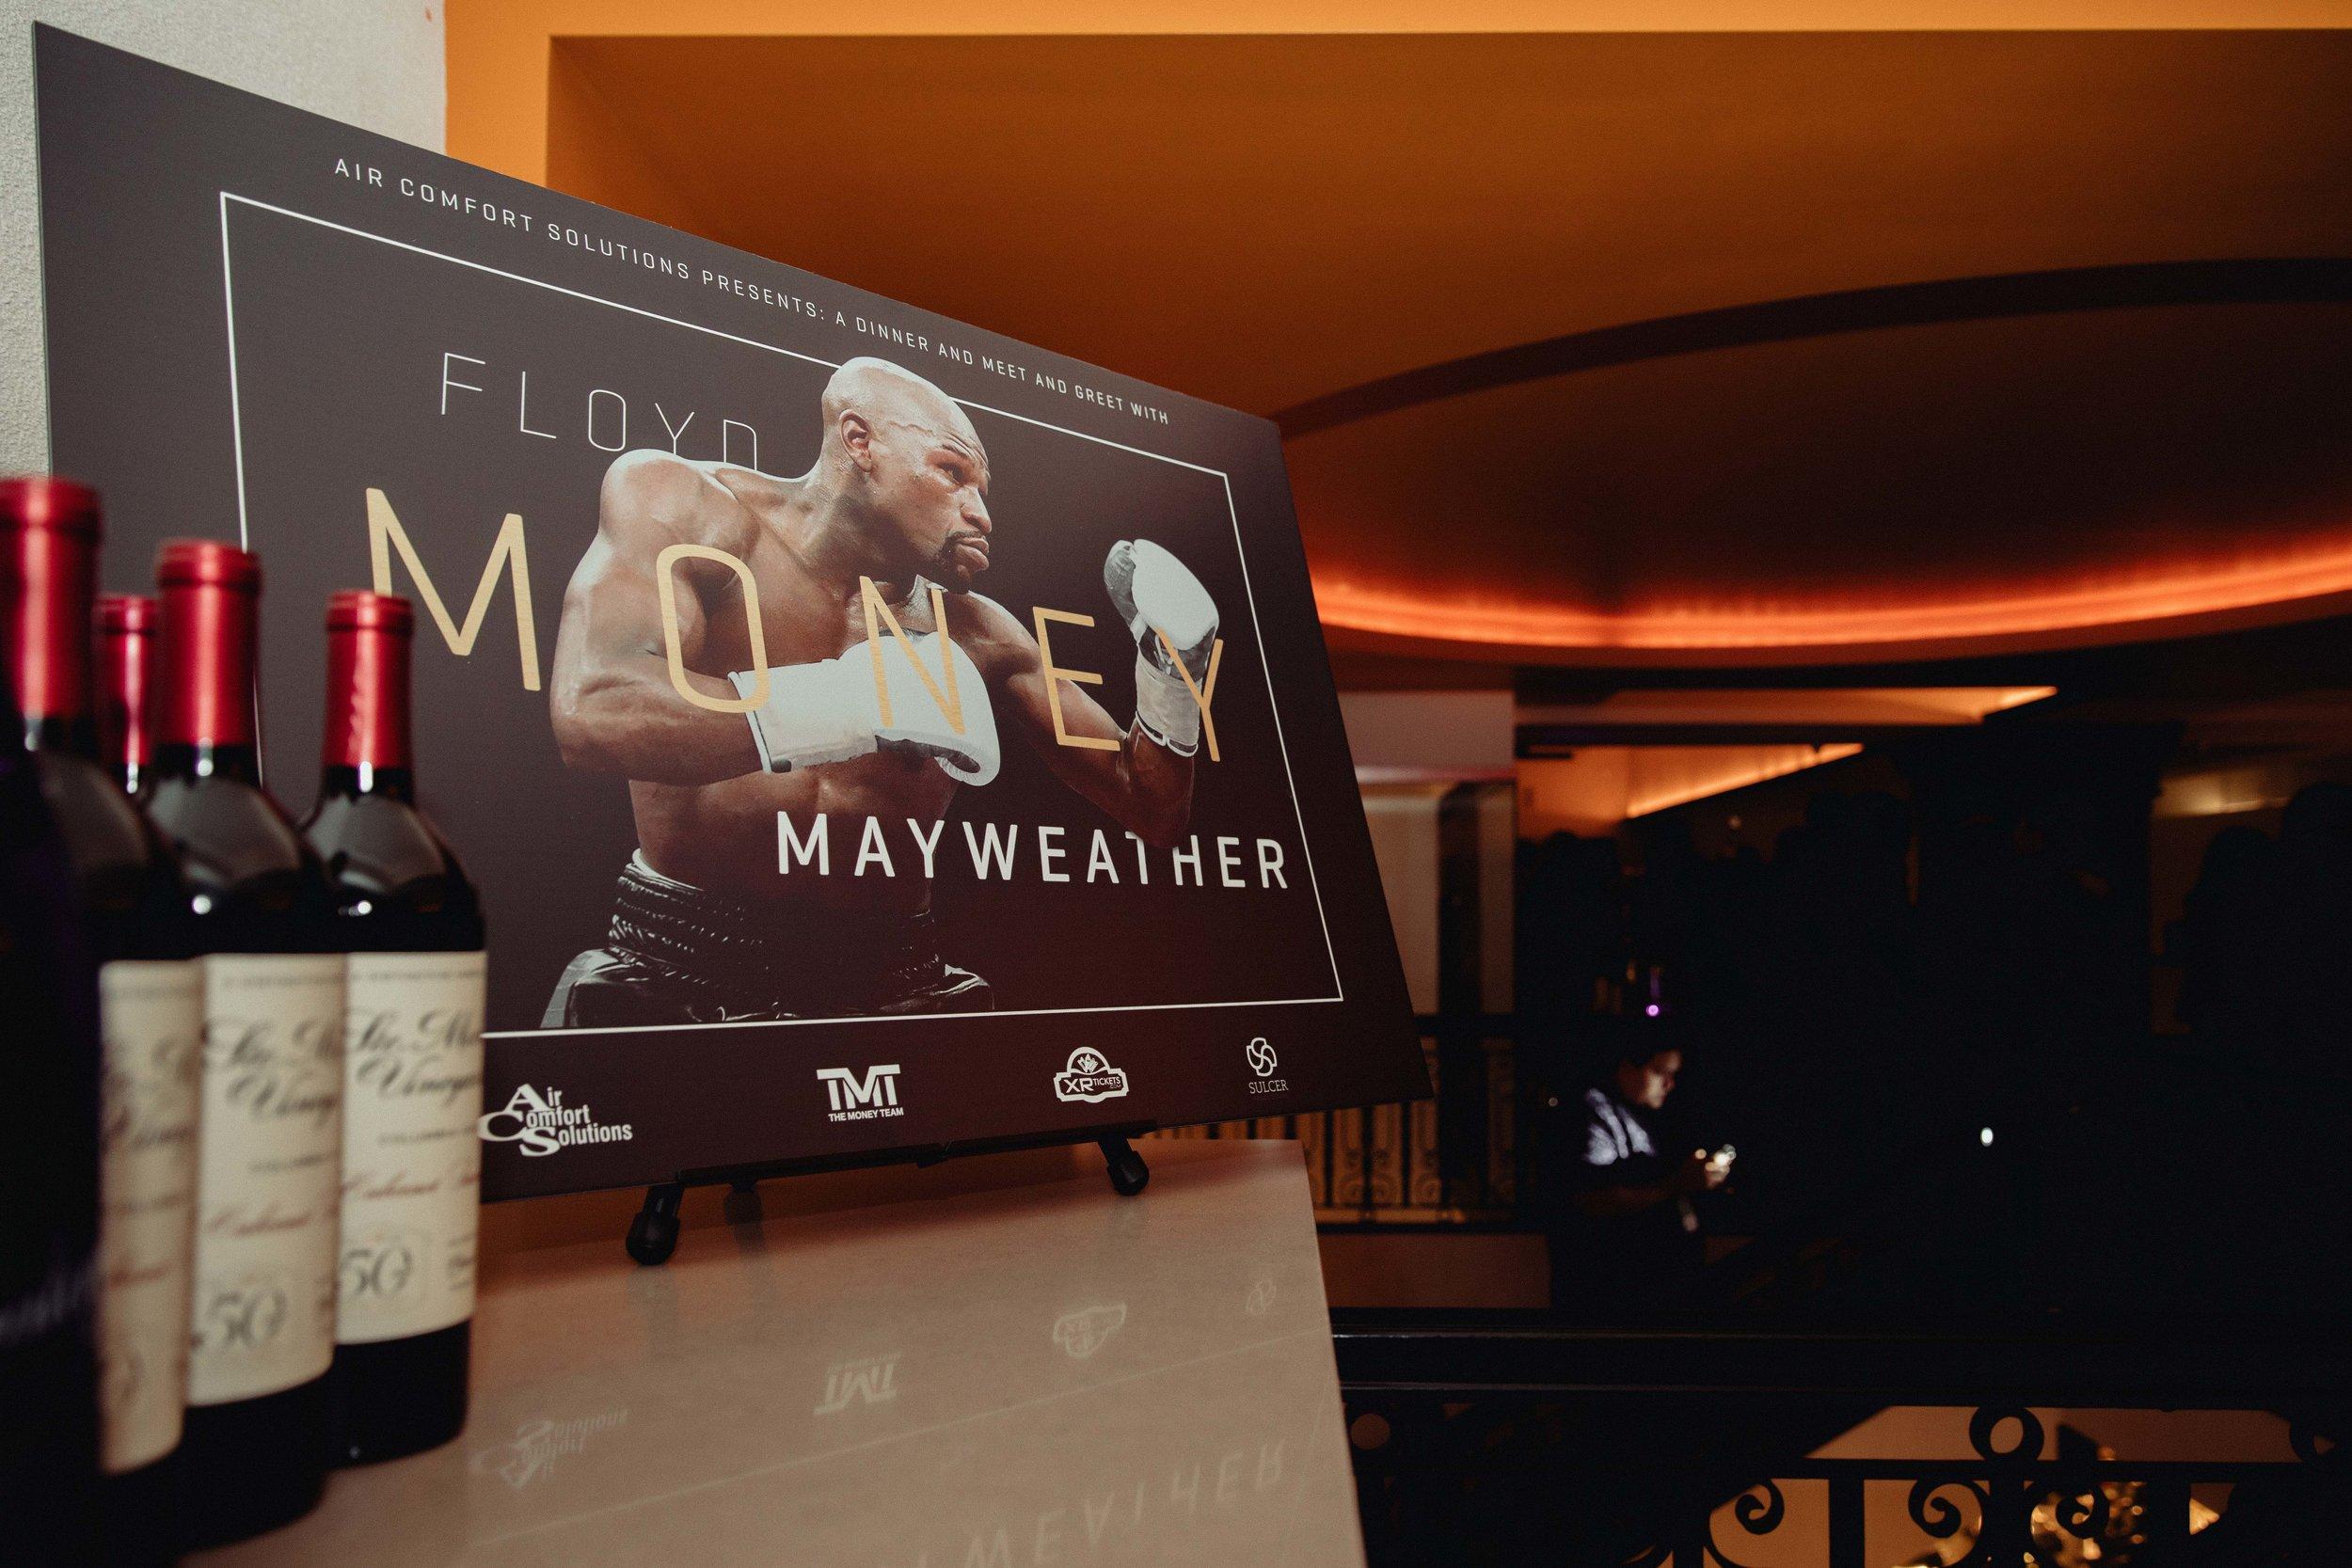 FloydMayweather-JonathanBurkhart-HighFiveMedia-LowResolutionFloydMayweather-JonathanBurkhart-HighFiveMedia-7Q6A2480.jpg